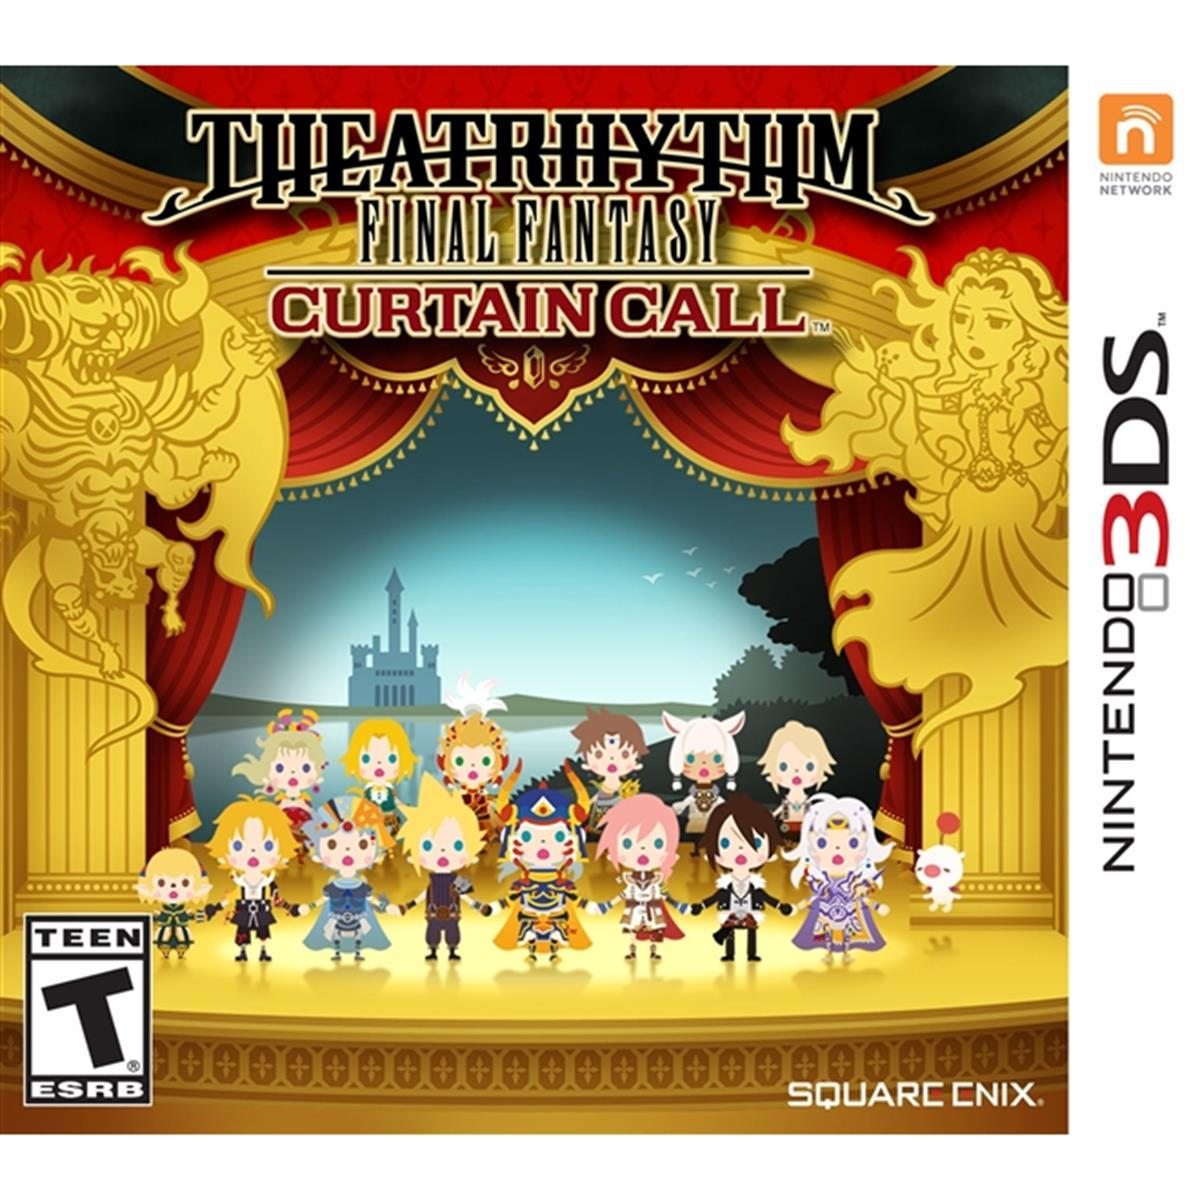 Theatrhythm Final Fantasy Curtain Call Limited Edition - 3Ds